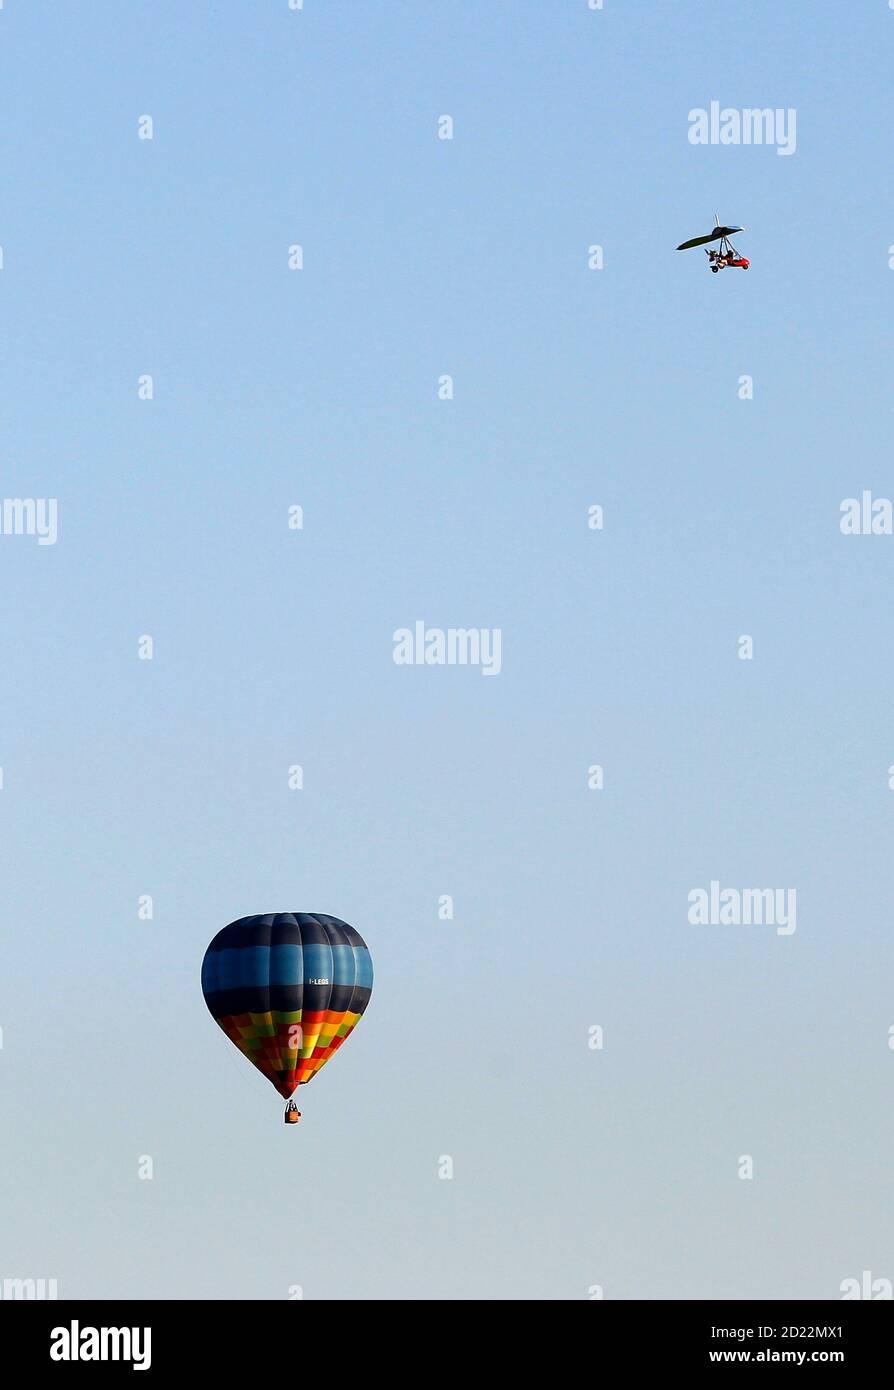 An ultralight aircraft flies near a hot air balloon over Alessandria May 22, 2010.   REUTERS/Alessandro Bianchi   (ITALY - Tags: SOCIETY TRANSPORT) Stock Photo